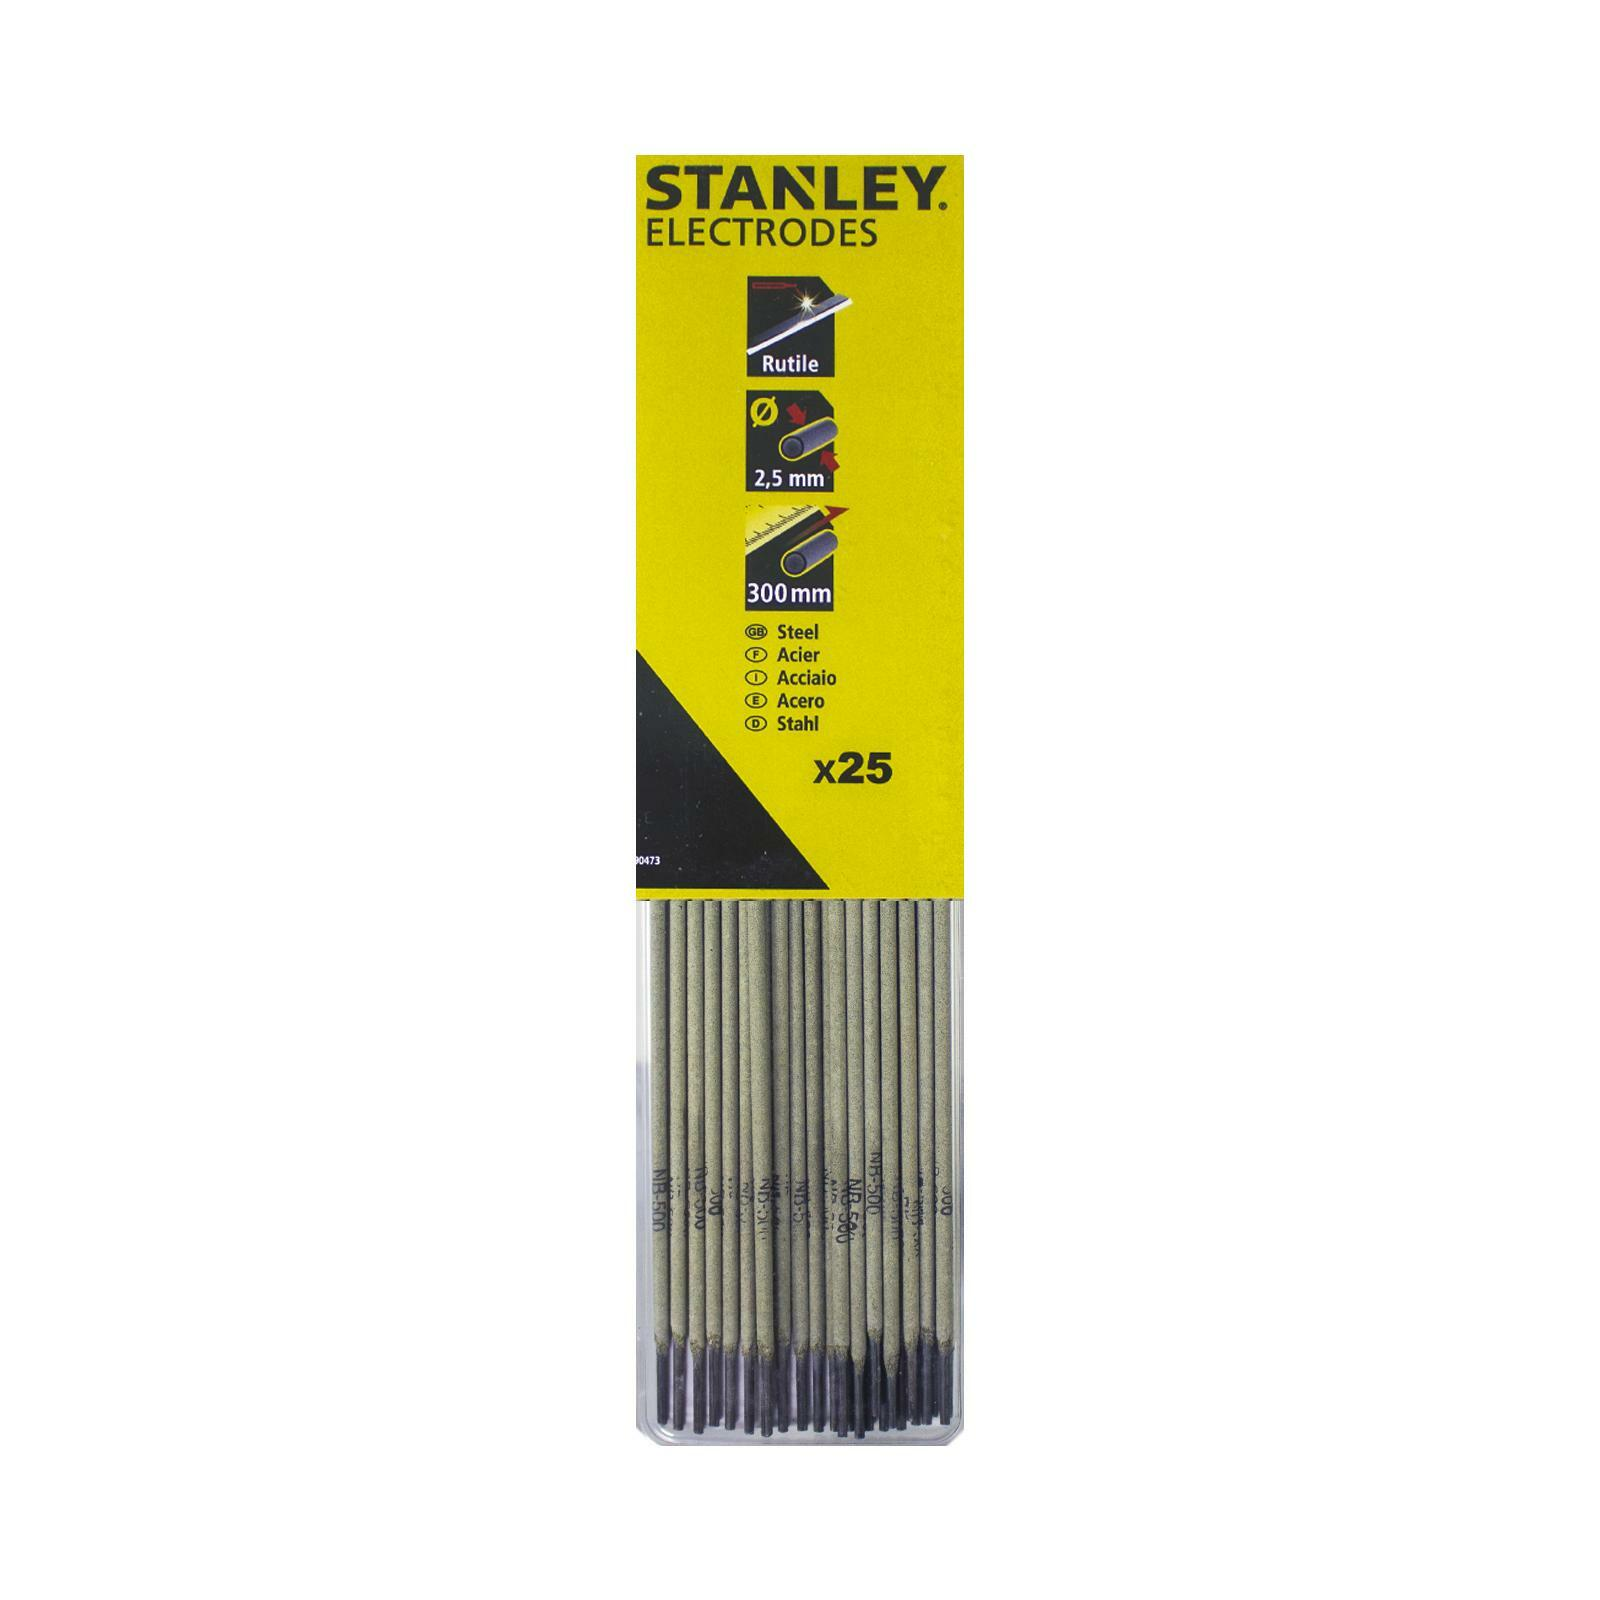 stanley elettrodi per saldatrice hbr 2,5x300 25 pezzi stanley